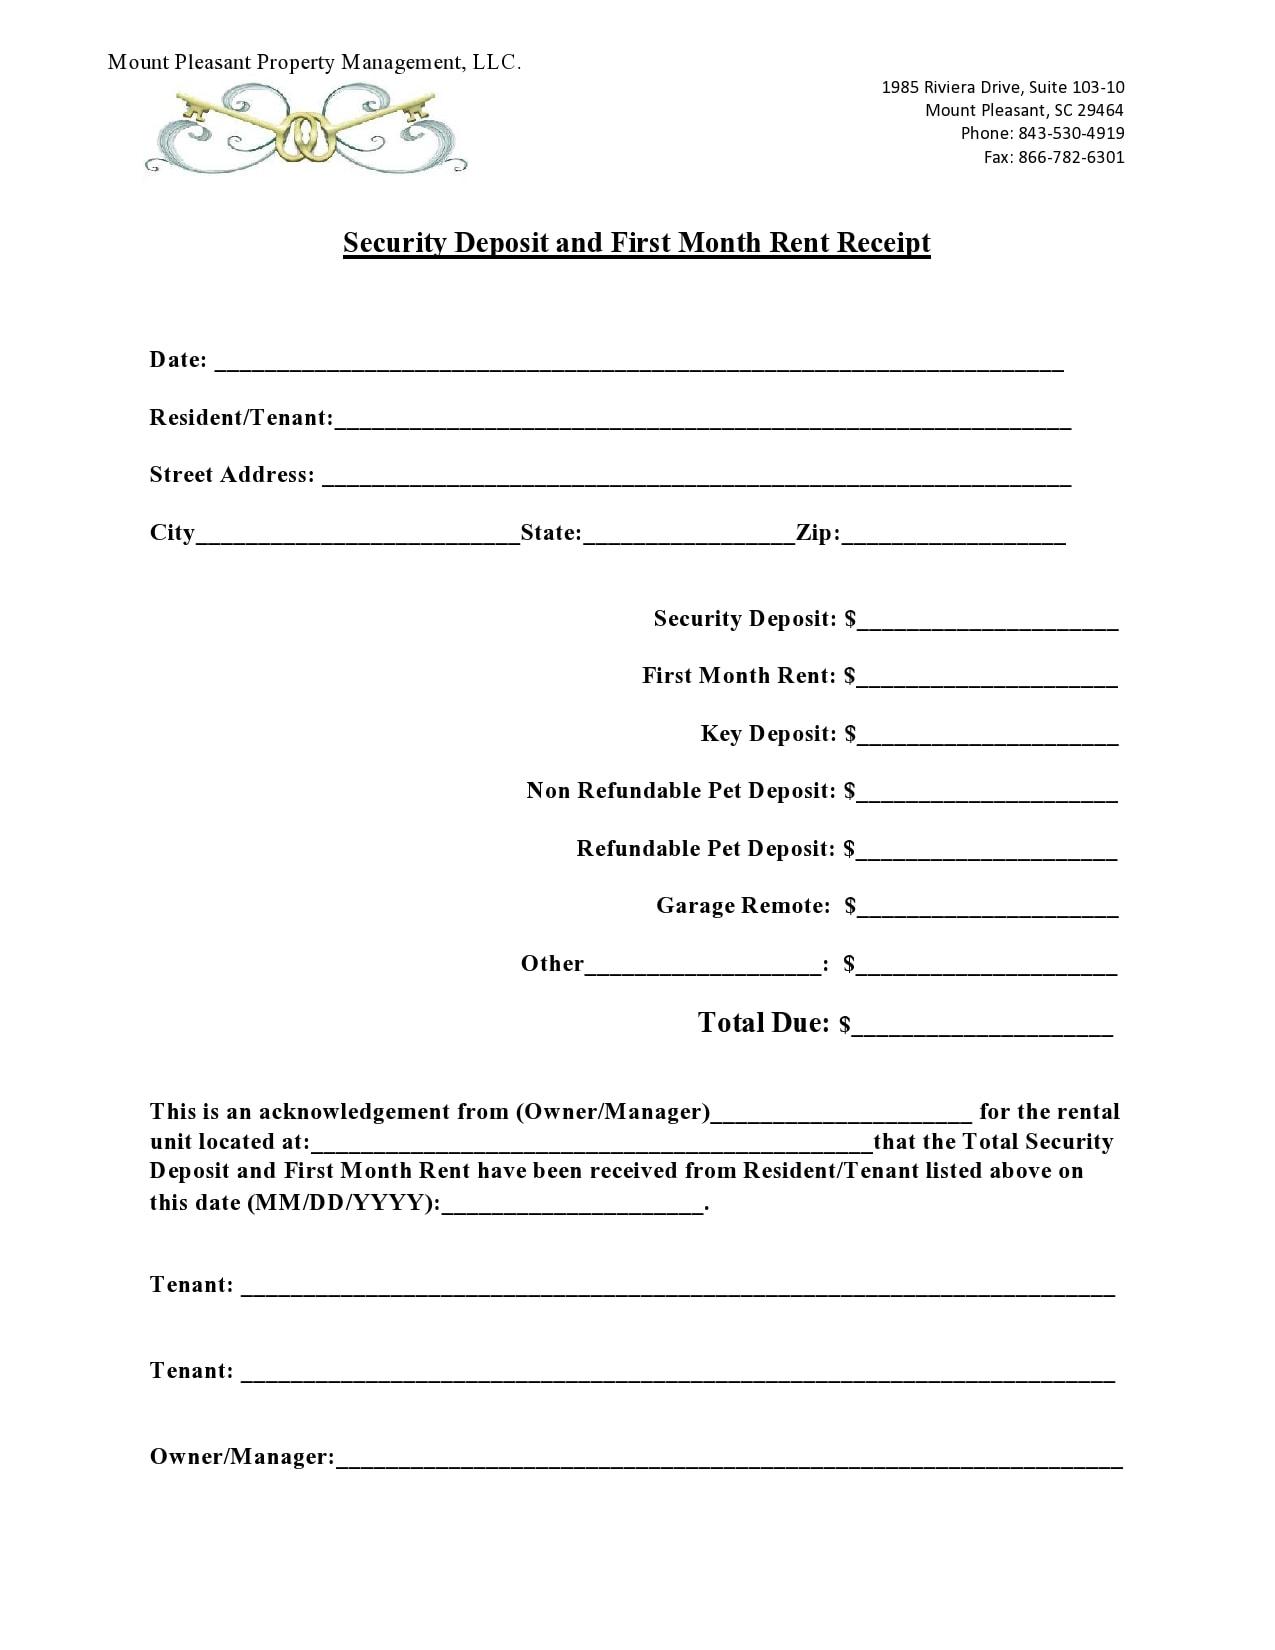 security deposit receipt 27